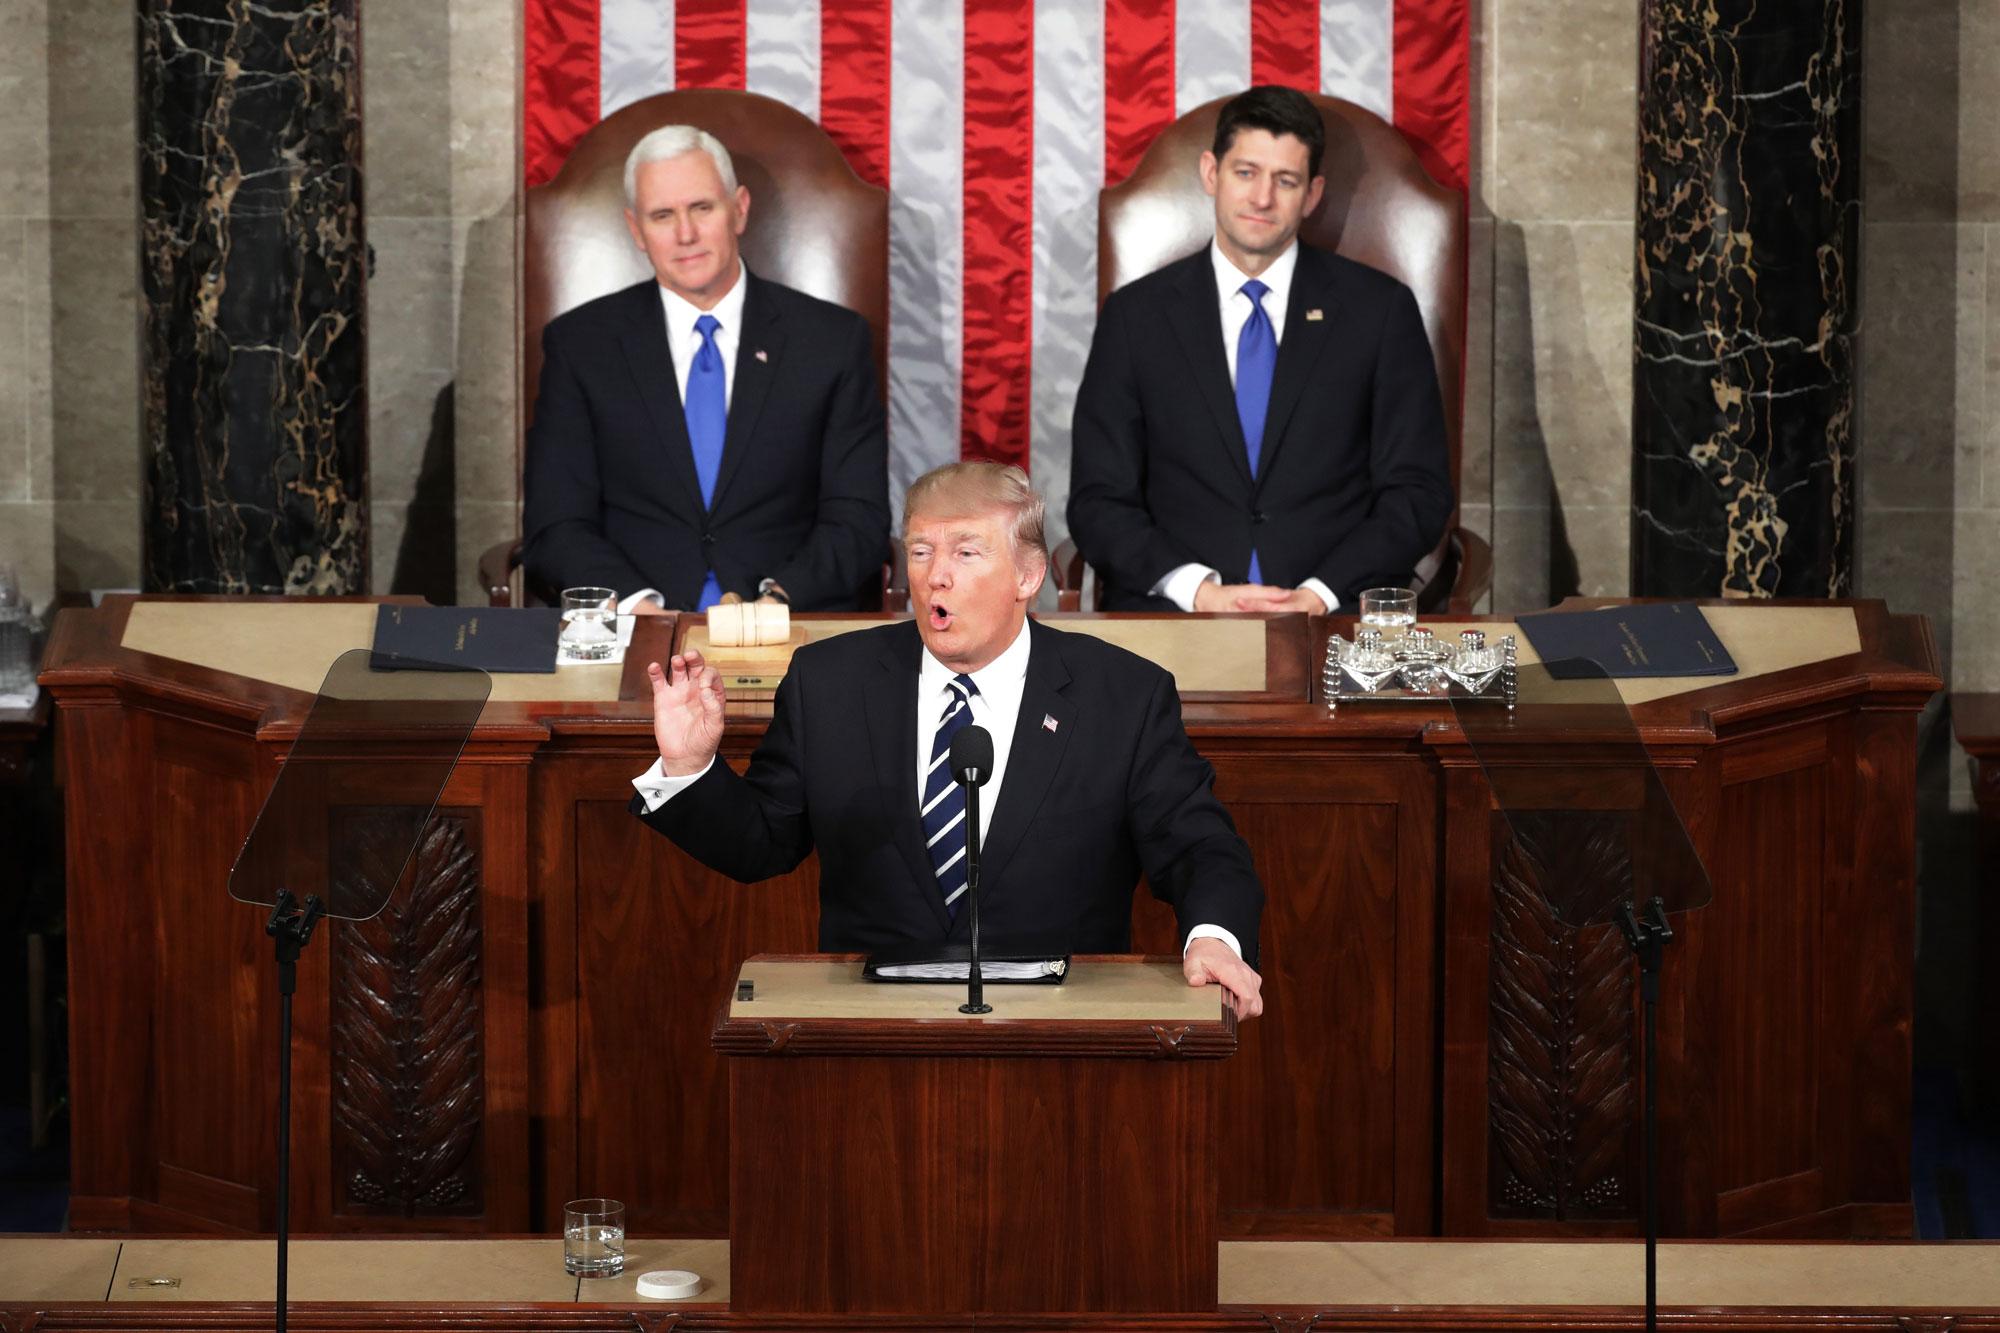 President Donald Trump addresses Congress last month.